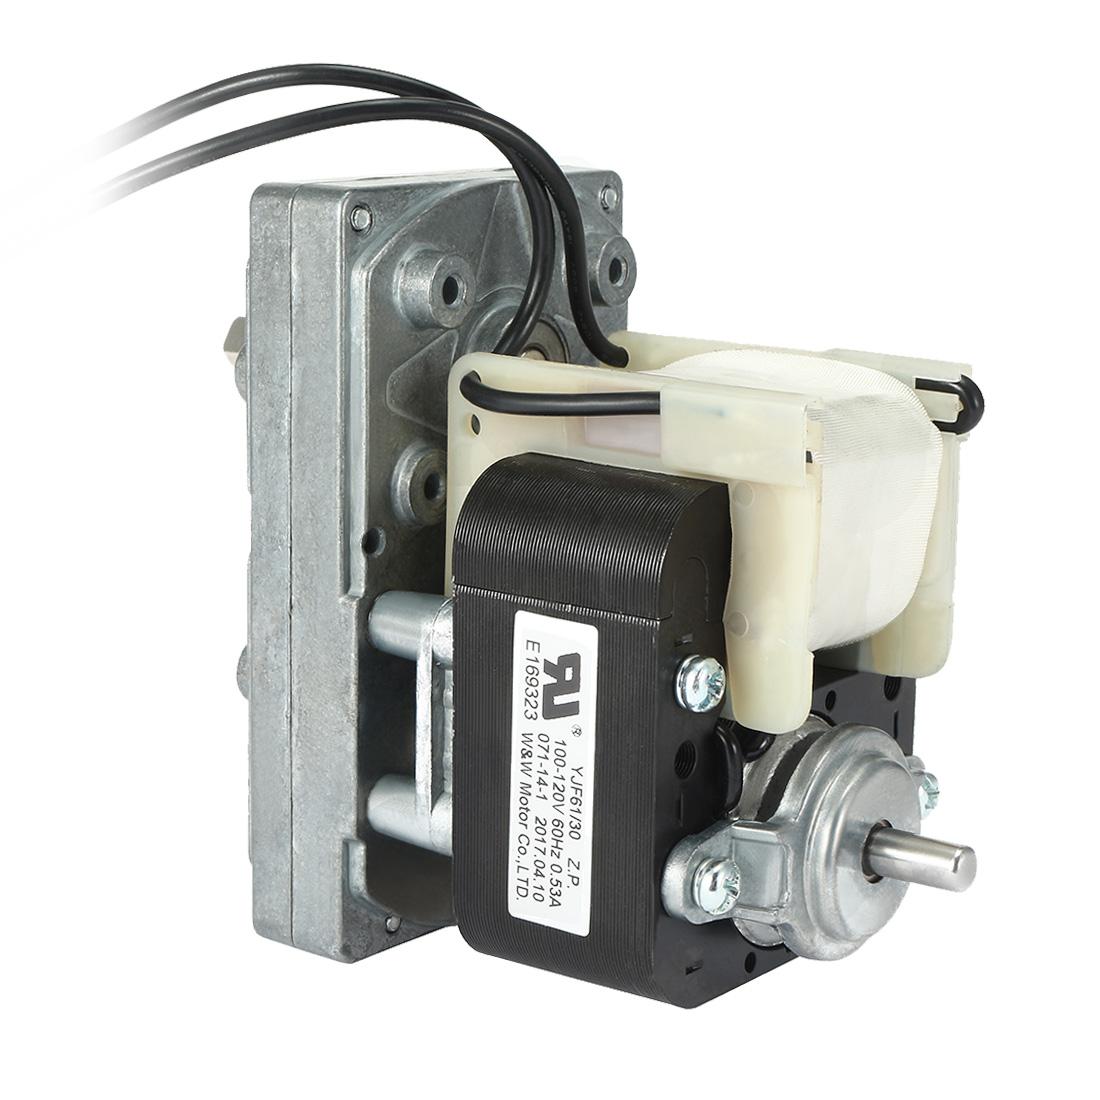 FC-YJ61 AC100V-120V 60Hz 4.8RPM CW Shaded Pole Motor Universal Geared Motor